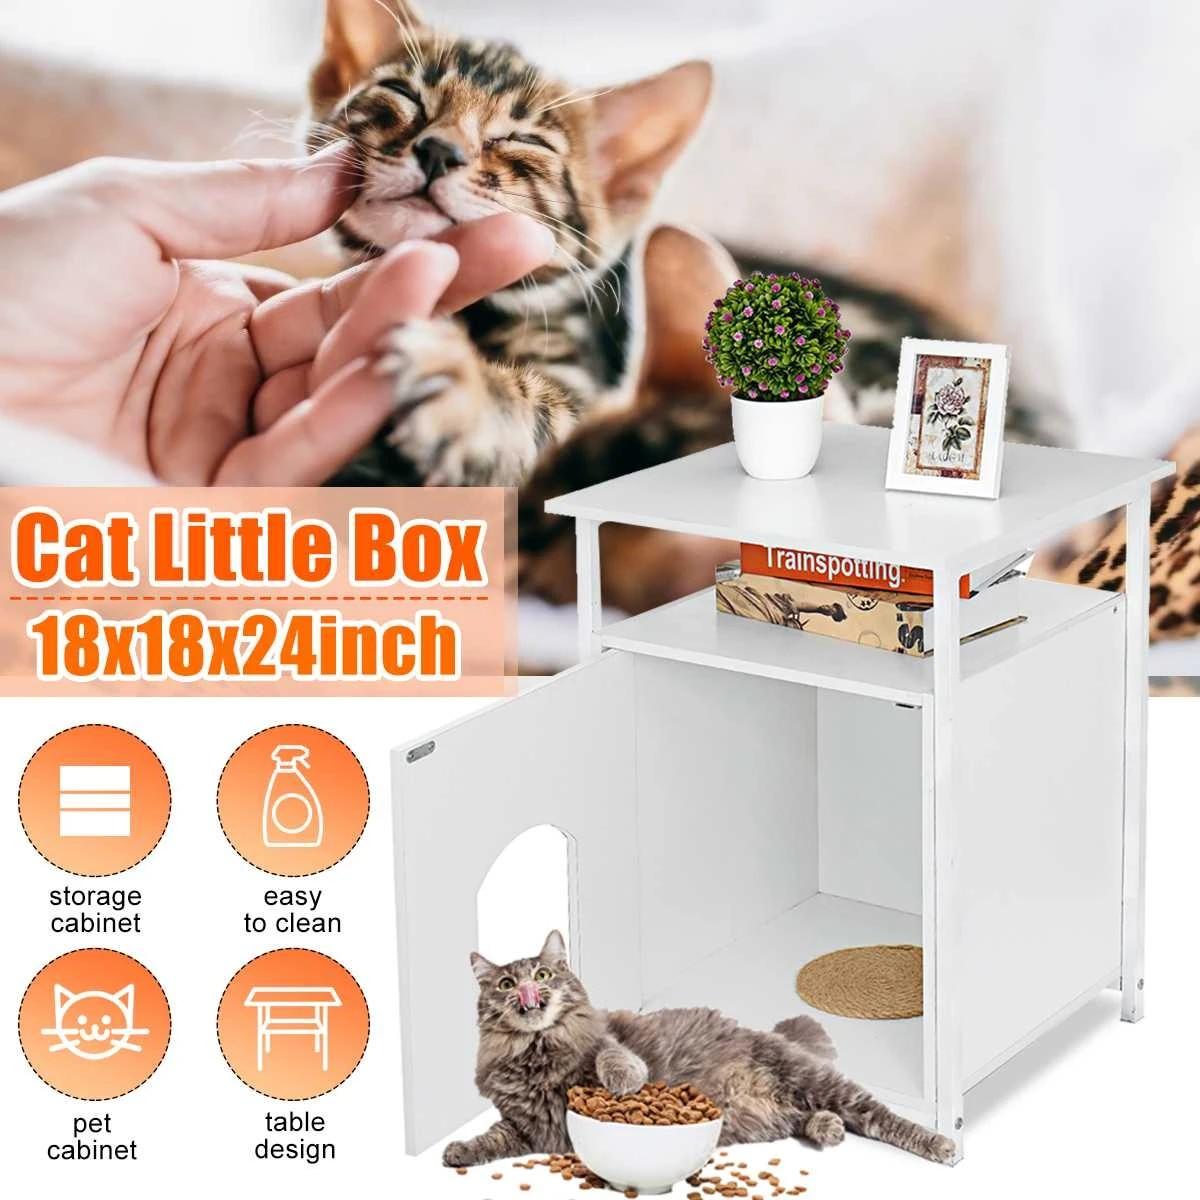 18x18x24in Nightstand Pet Cat House Decorative Cat Home Nightstand Litter Box Furniture Enclosure Indoor Pet Crate Cat Washroom Furniture Scratchers Aliexpress